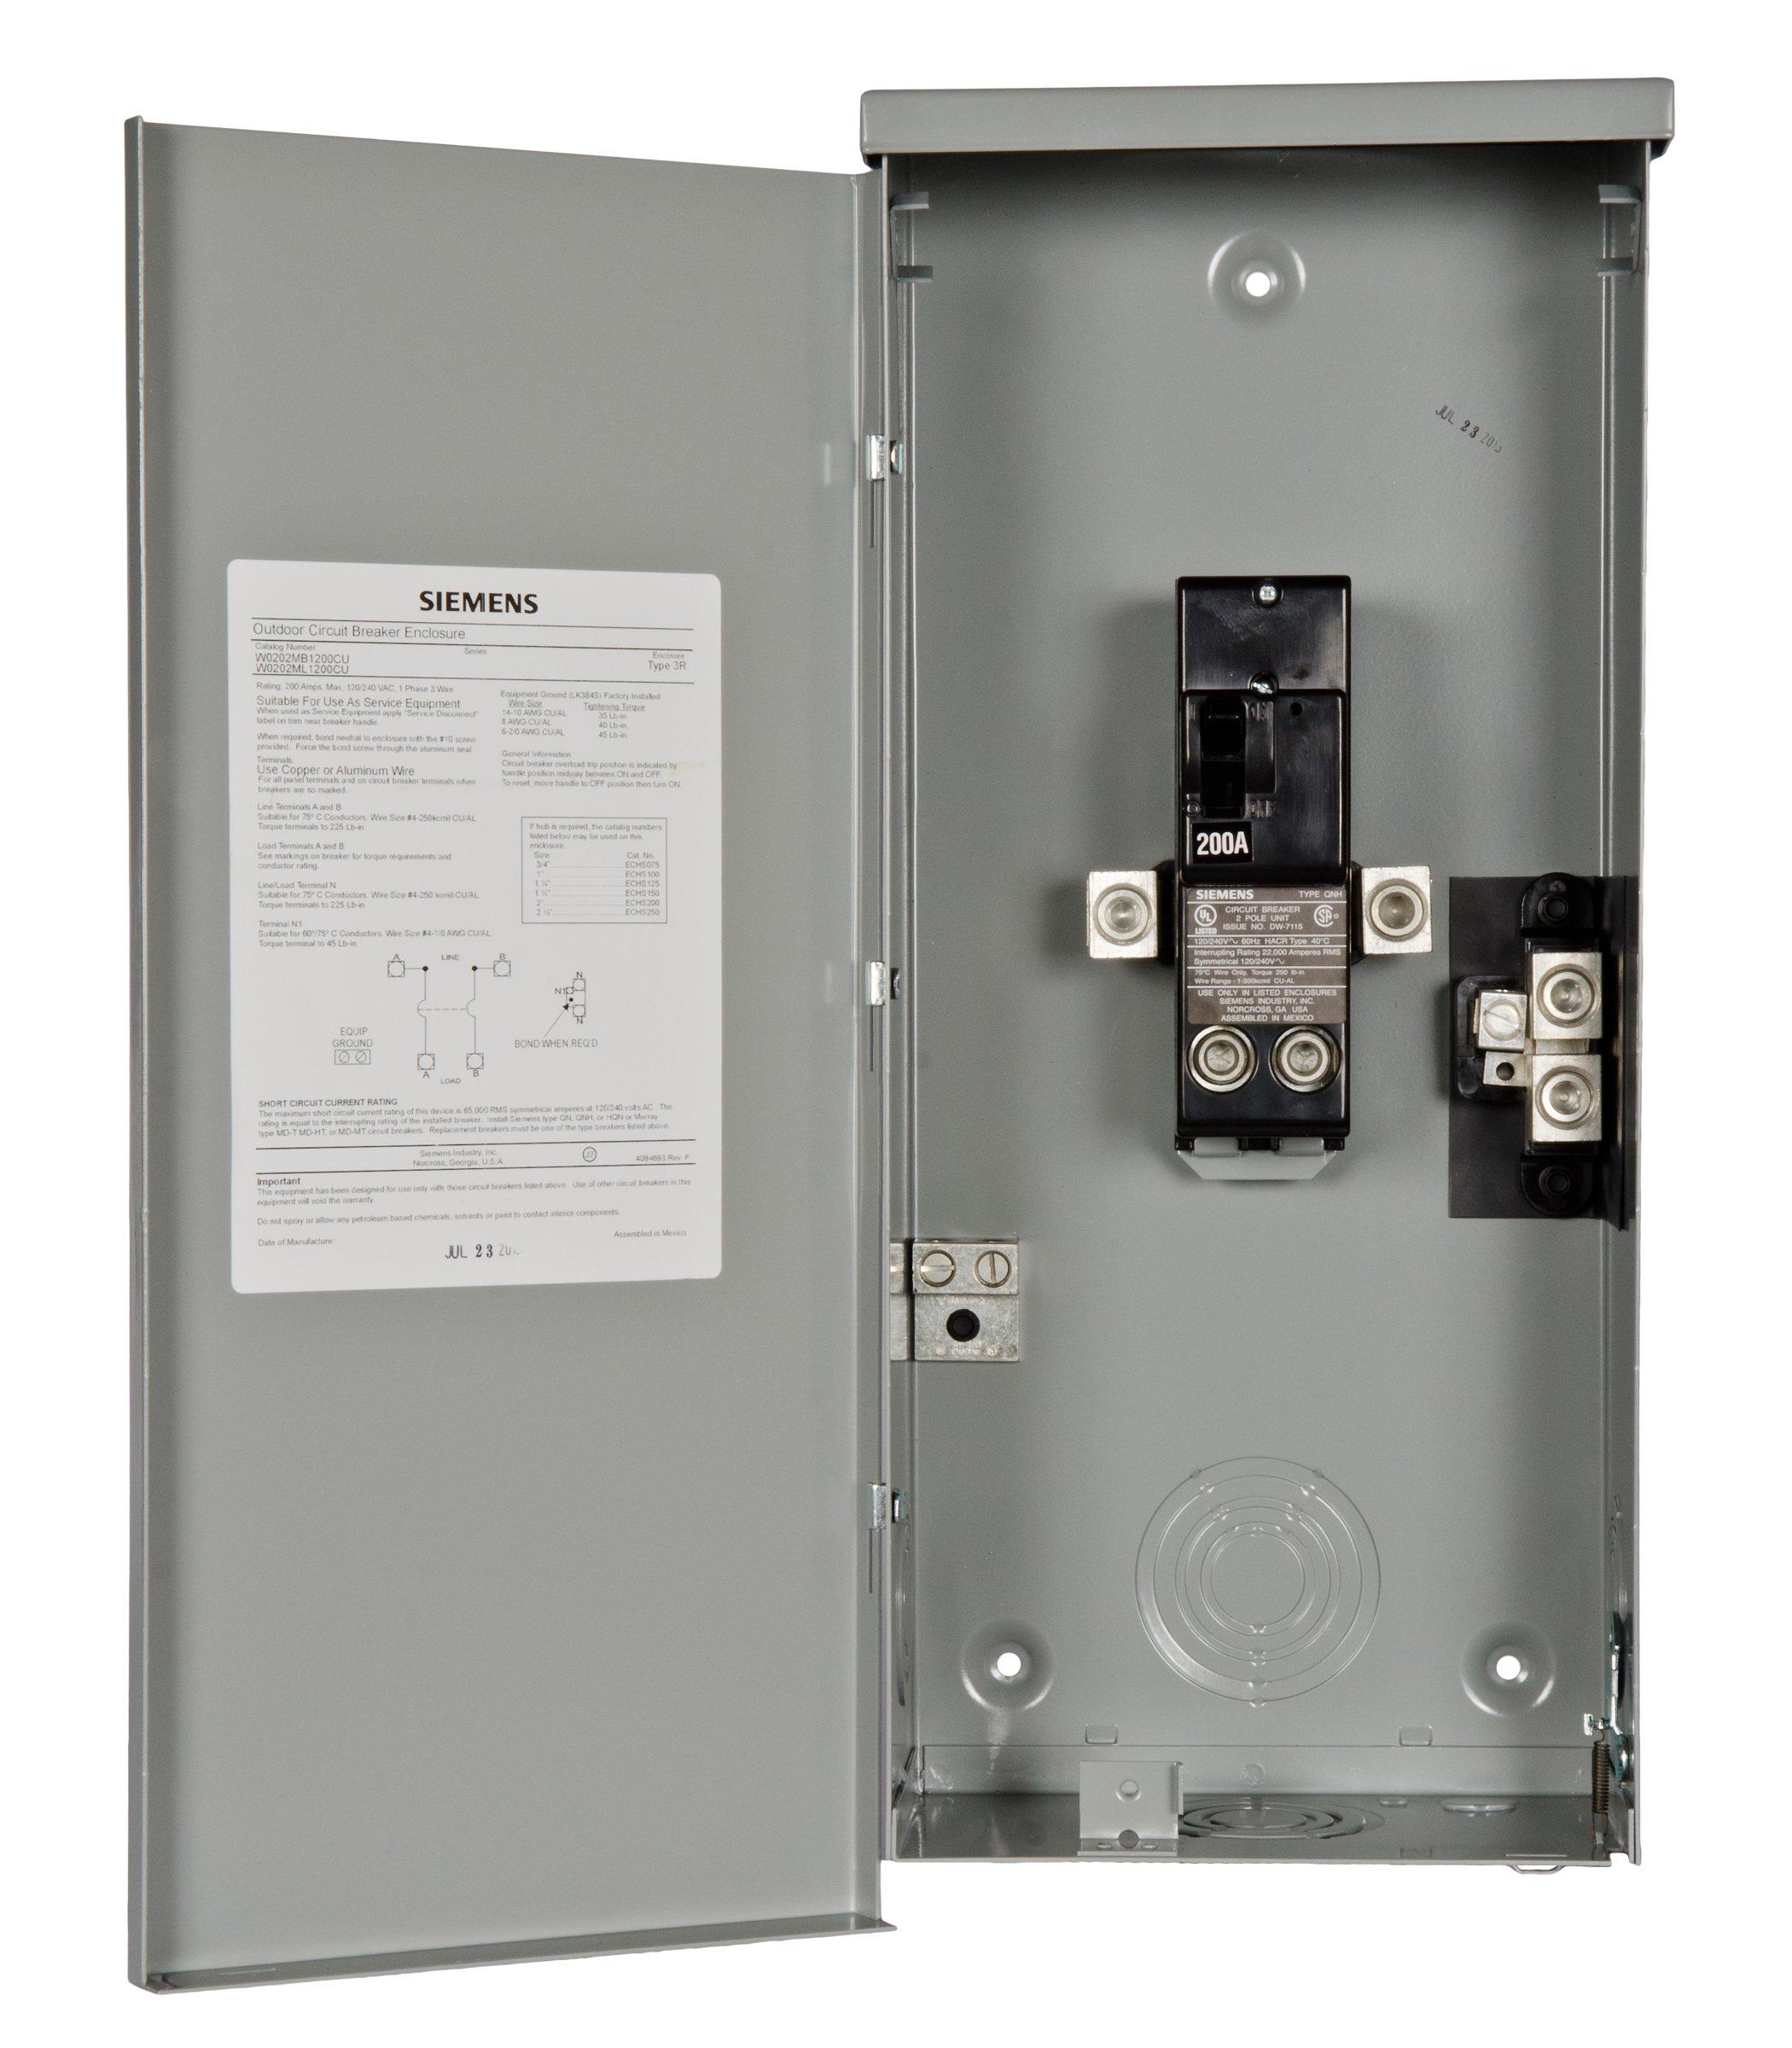 Siemens W0202mb1200cu 200 Amp Outdoor Circuit Breaker Enclosure Troubleshooting Electrical Circuits 129 00